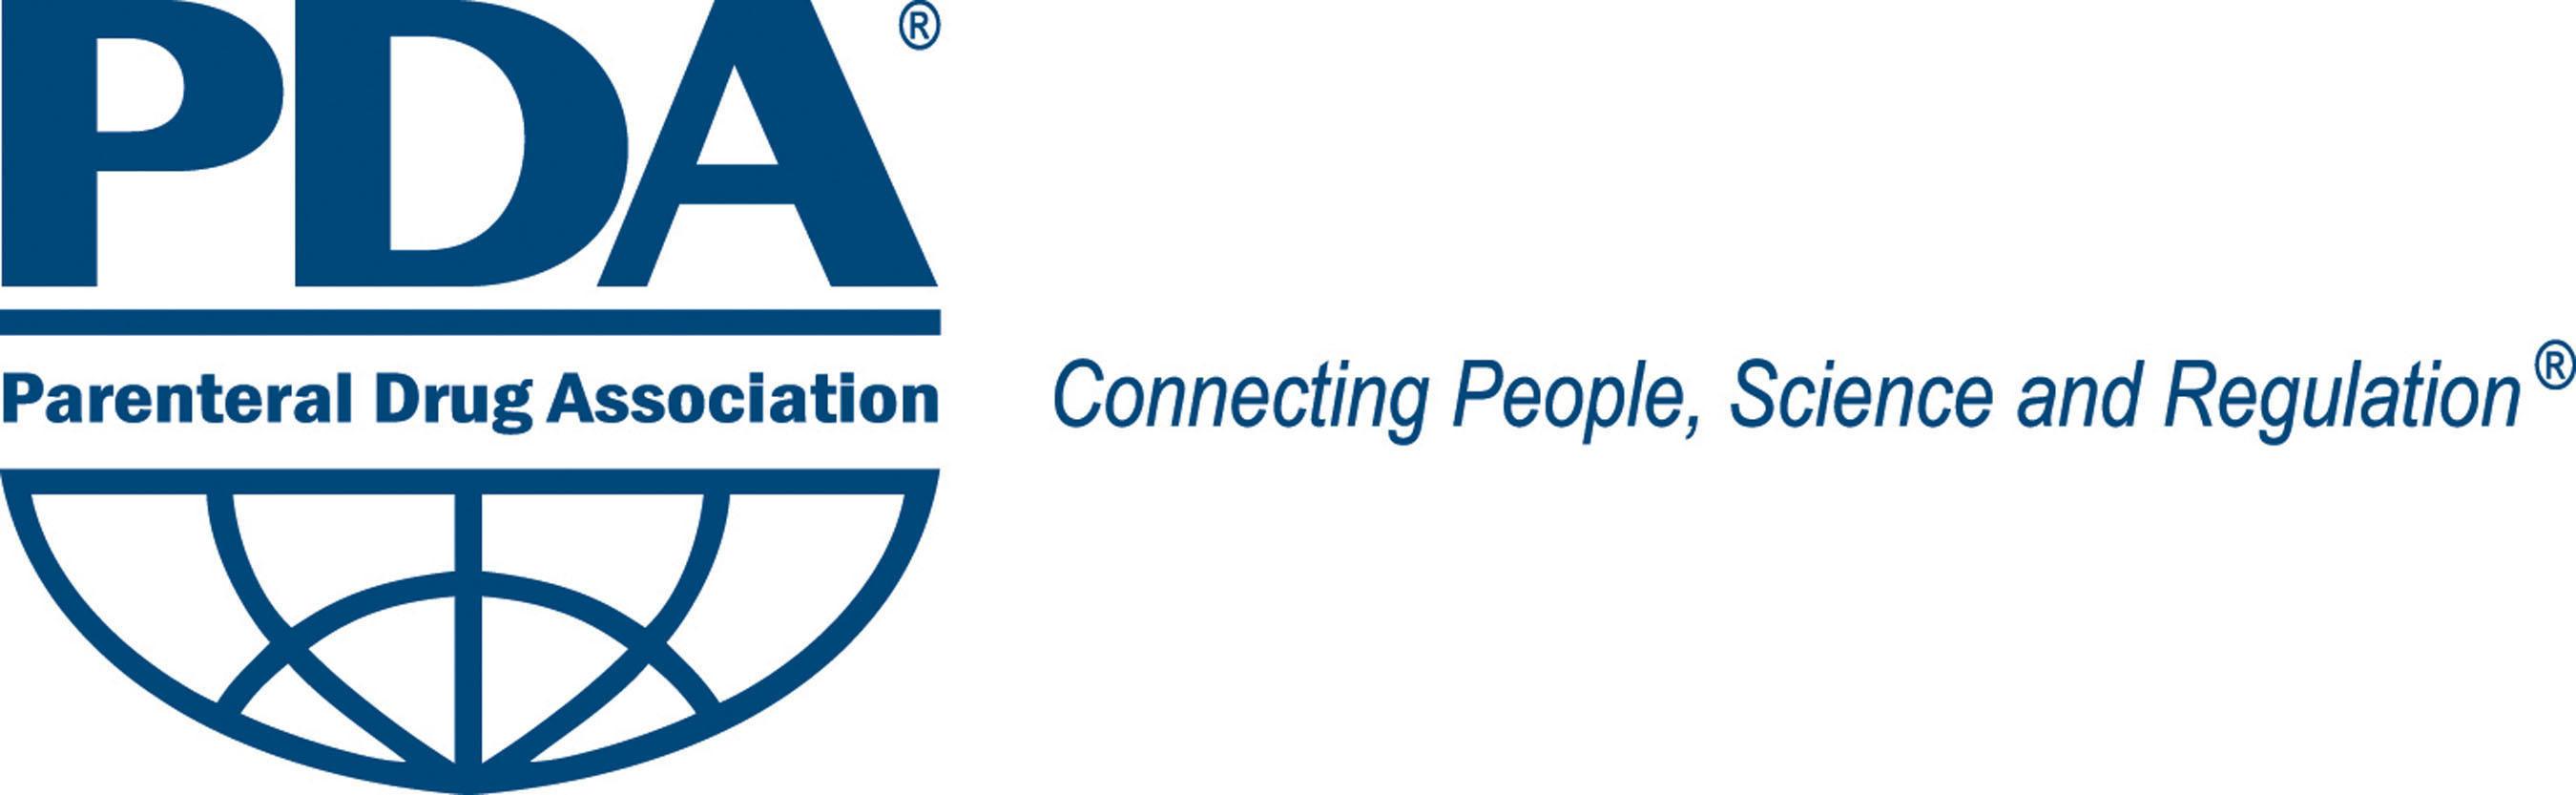 Logo for Parenteral Drug Association.